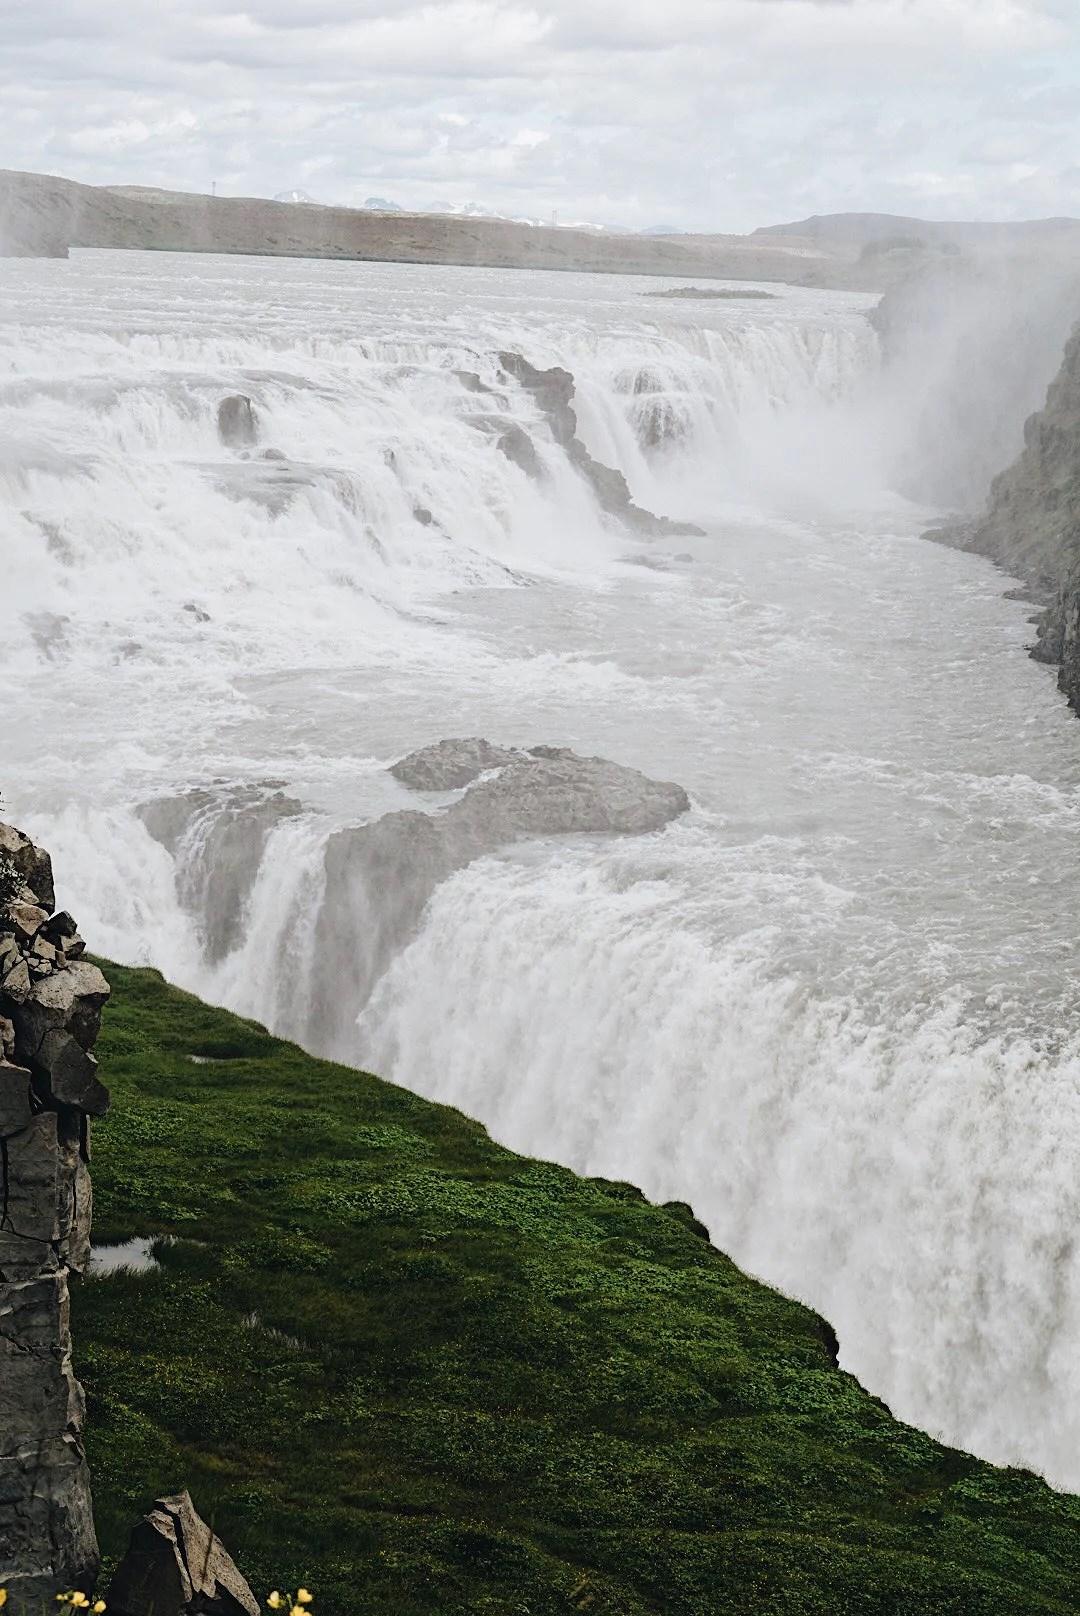 Utflykt på Island